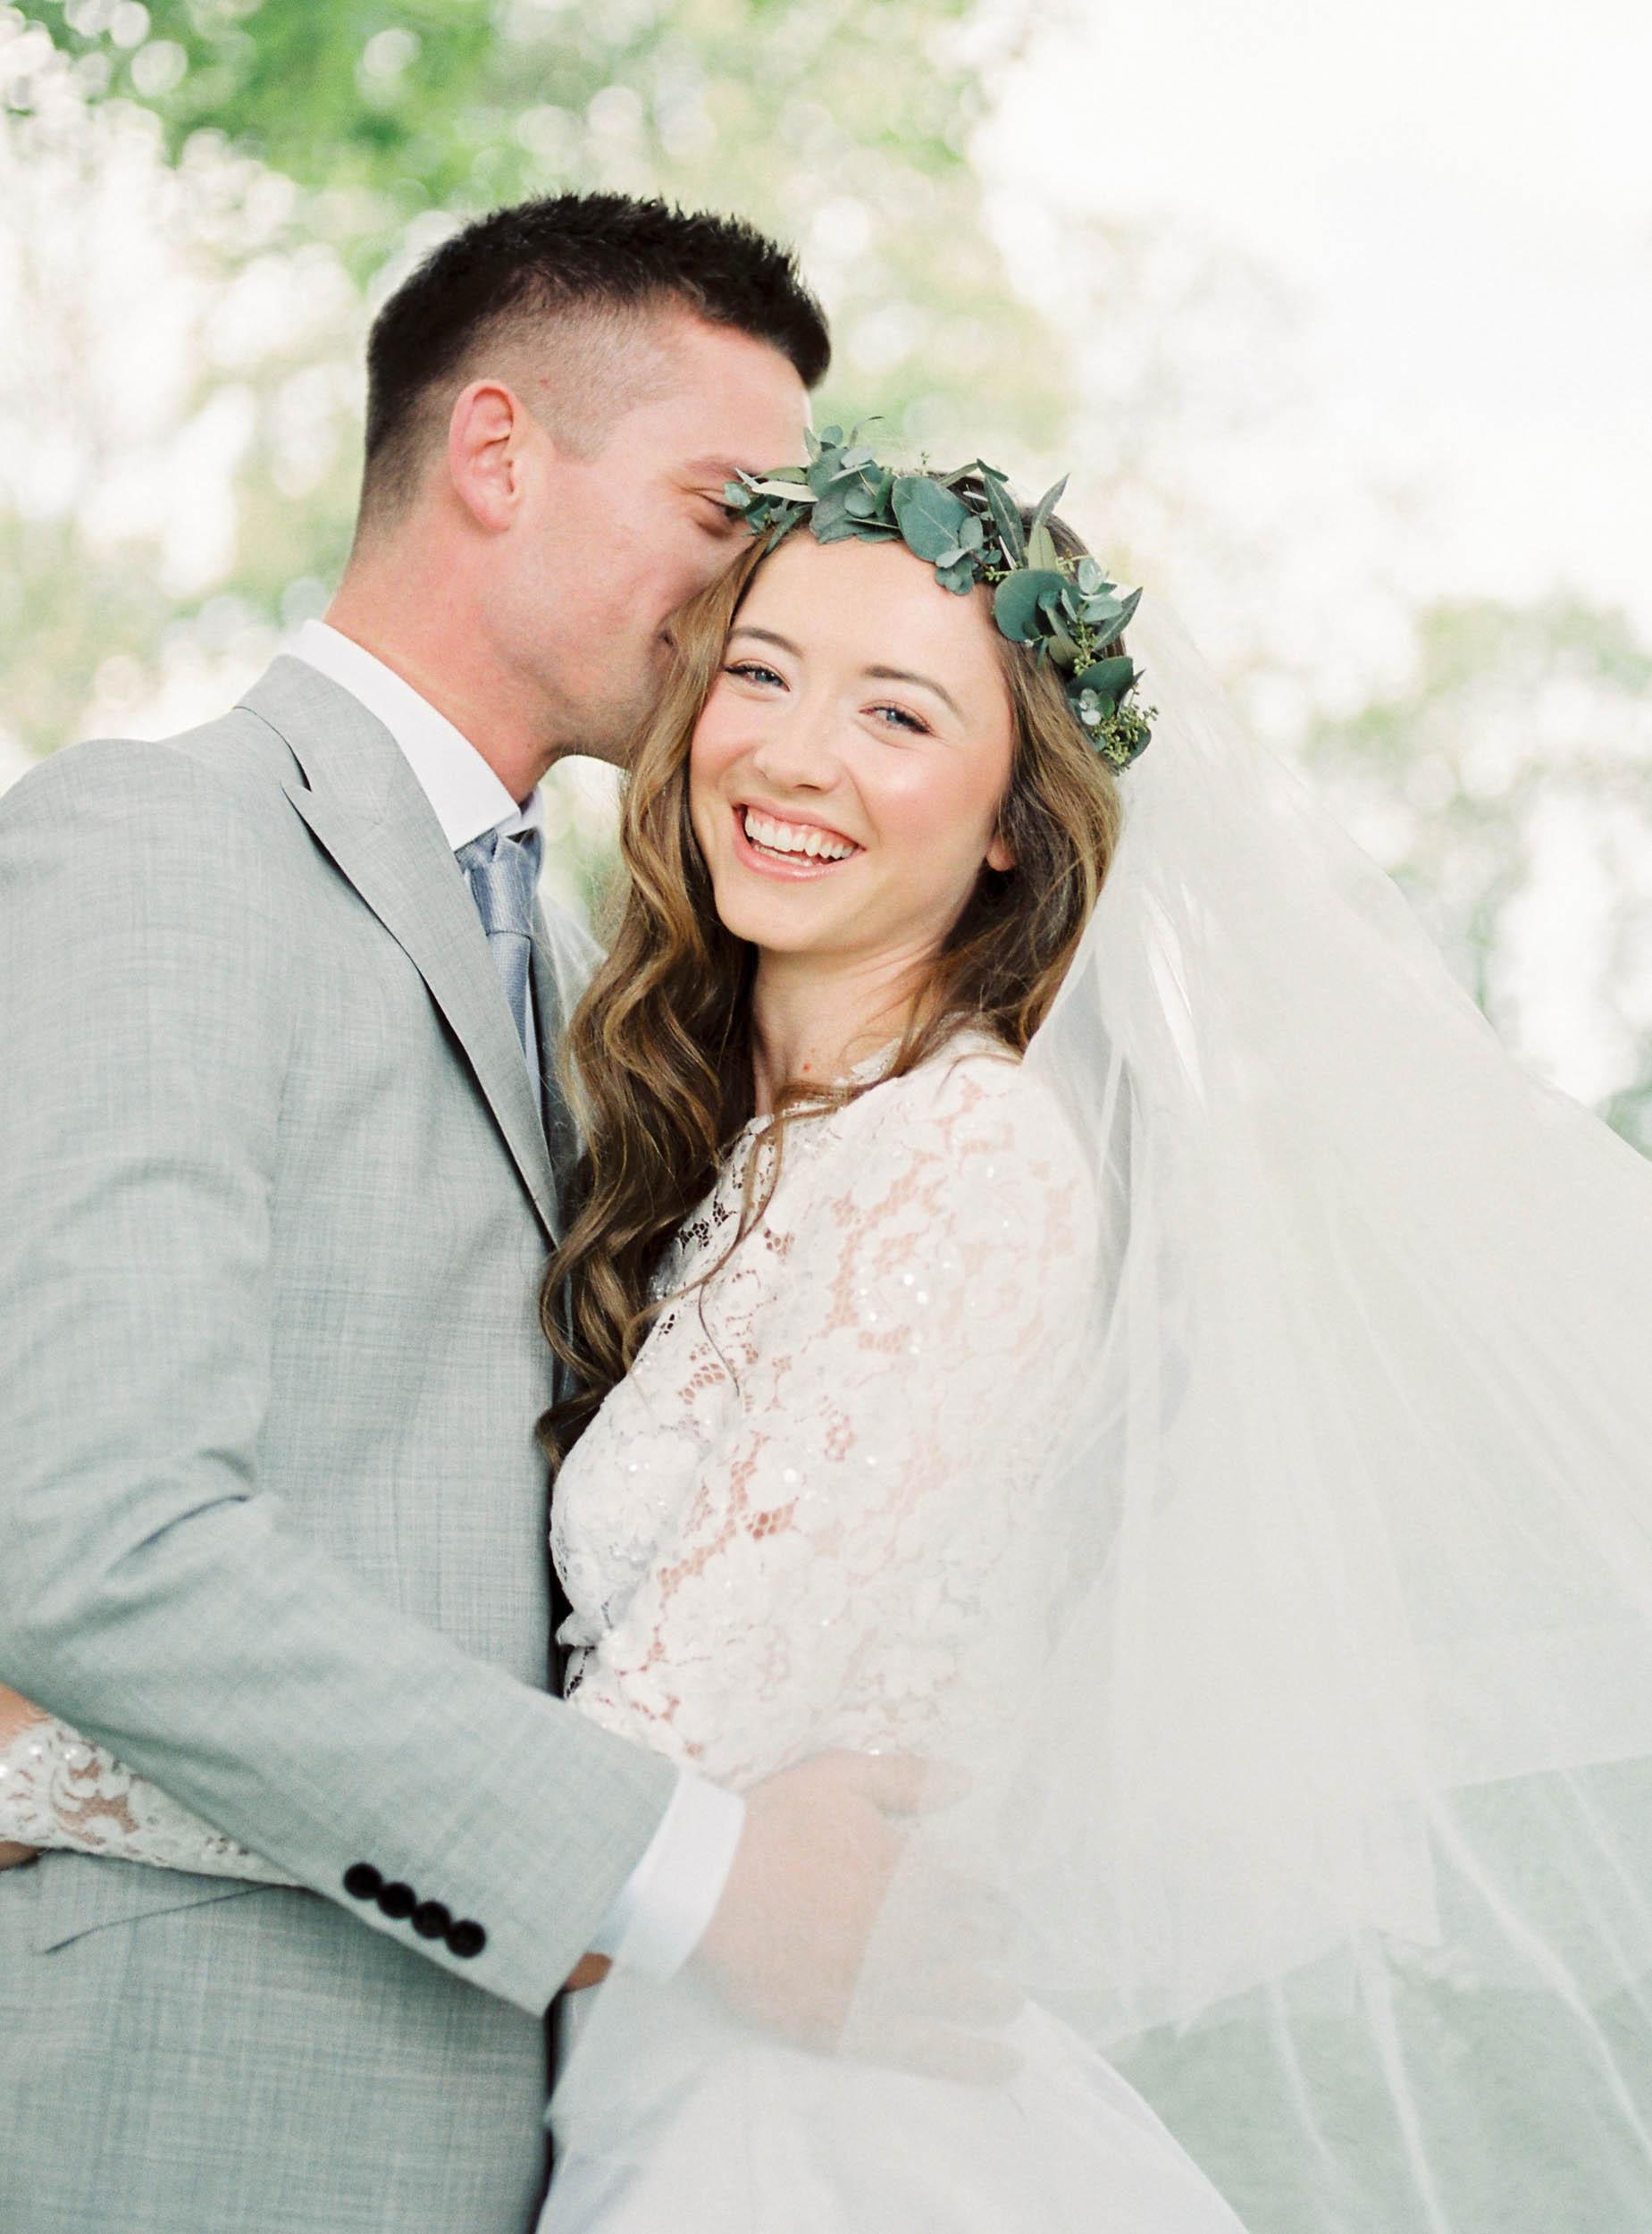 Amy O'Boyle Photography- Destination & UK Fine Art Film Wedding Photographer- Stubton Hall Wedding Shoot-21.jpg